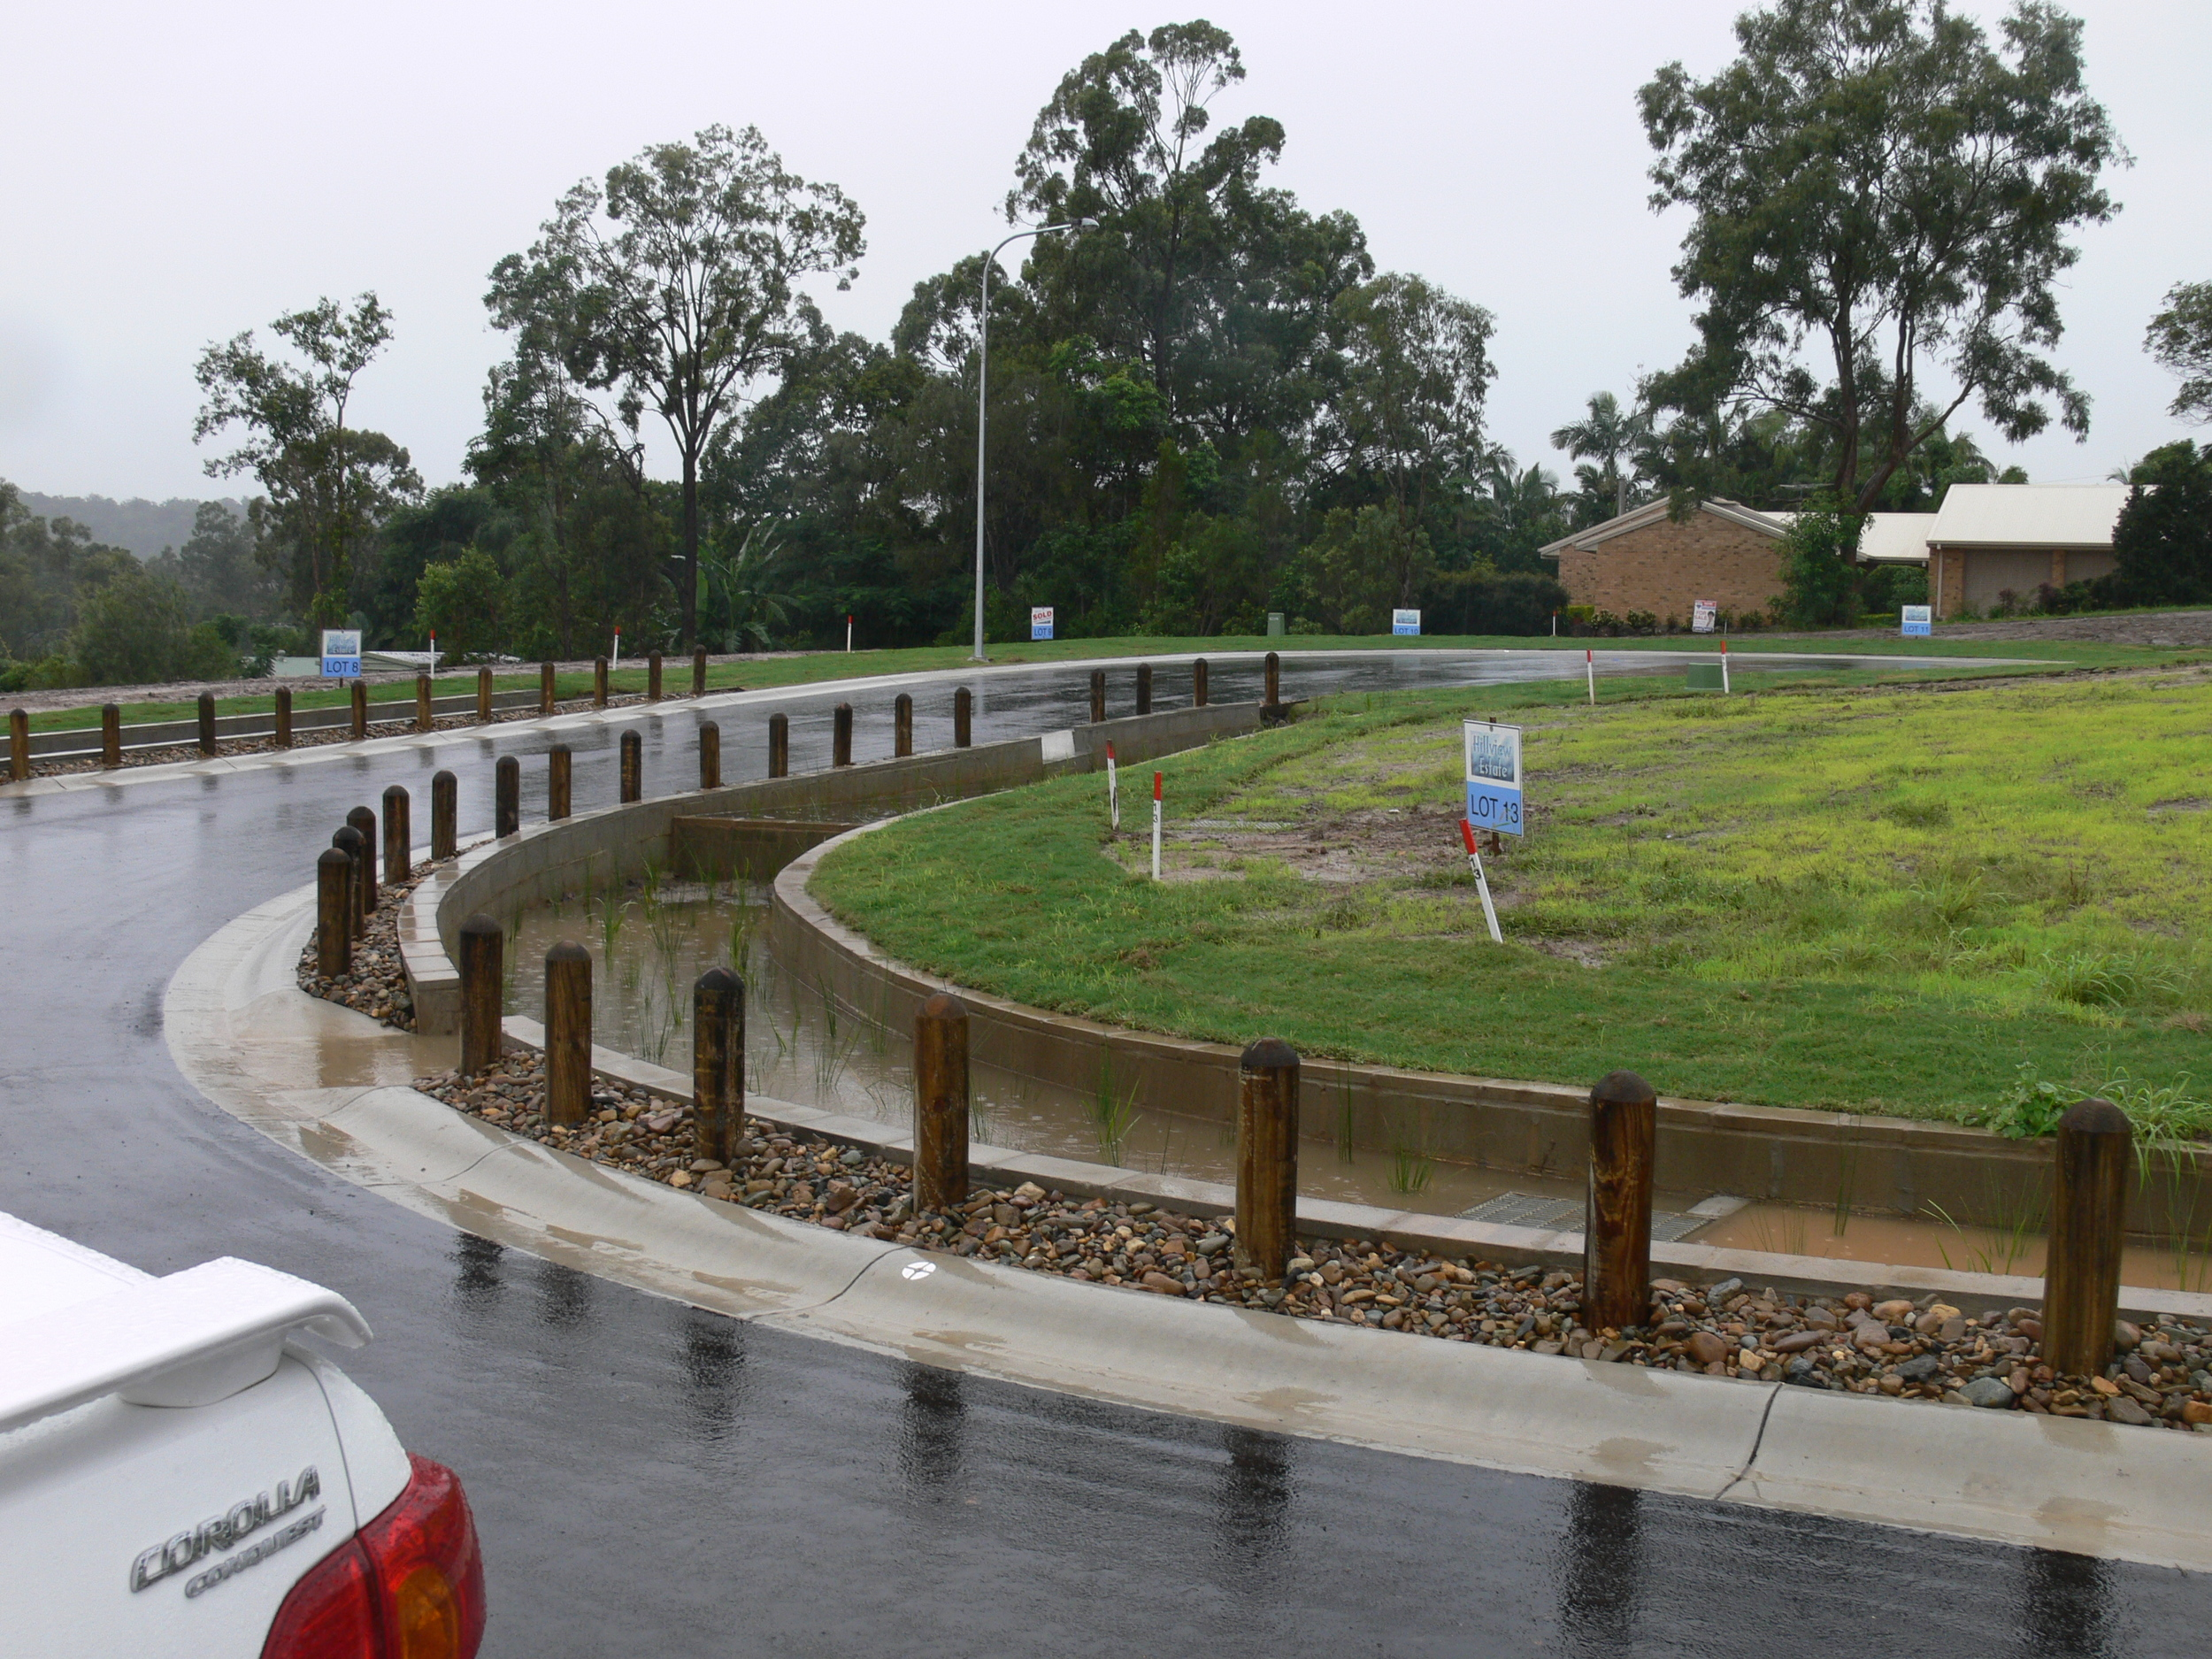 Shailer Rd Bioretention System